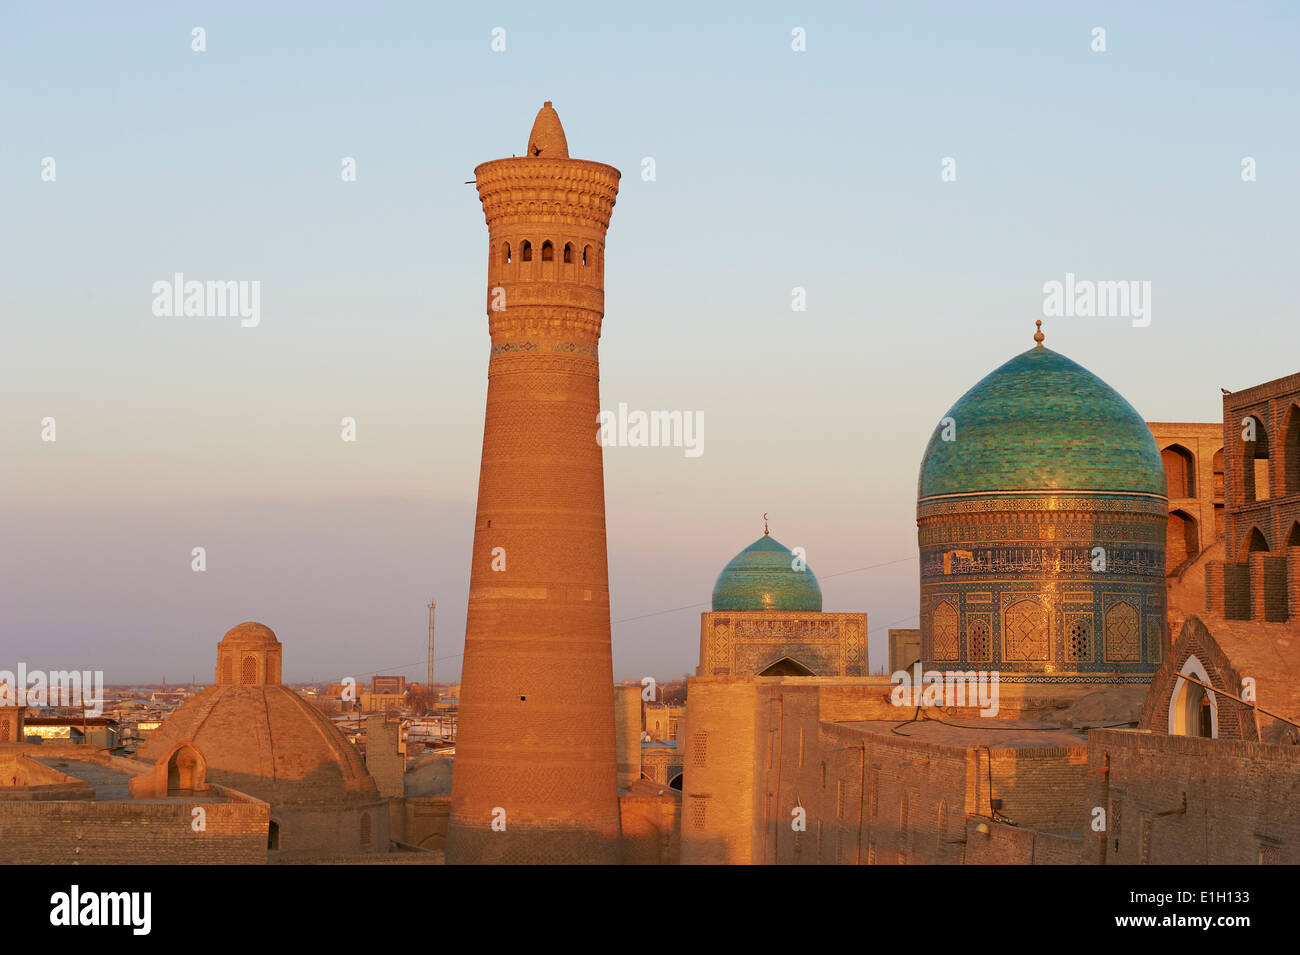 Uzbekistan, Bukhara, Unesco world heritage, Kalon mosque - Stock Image